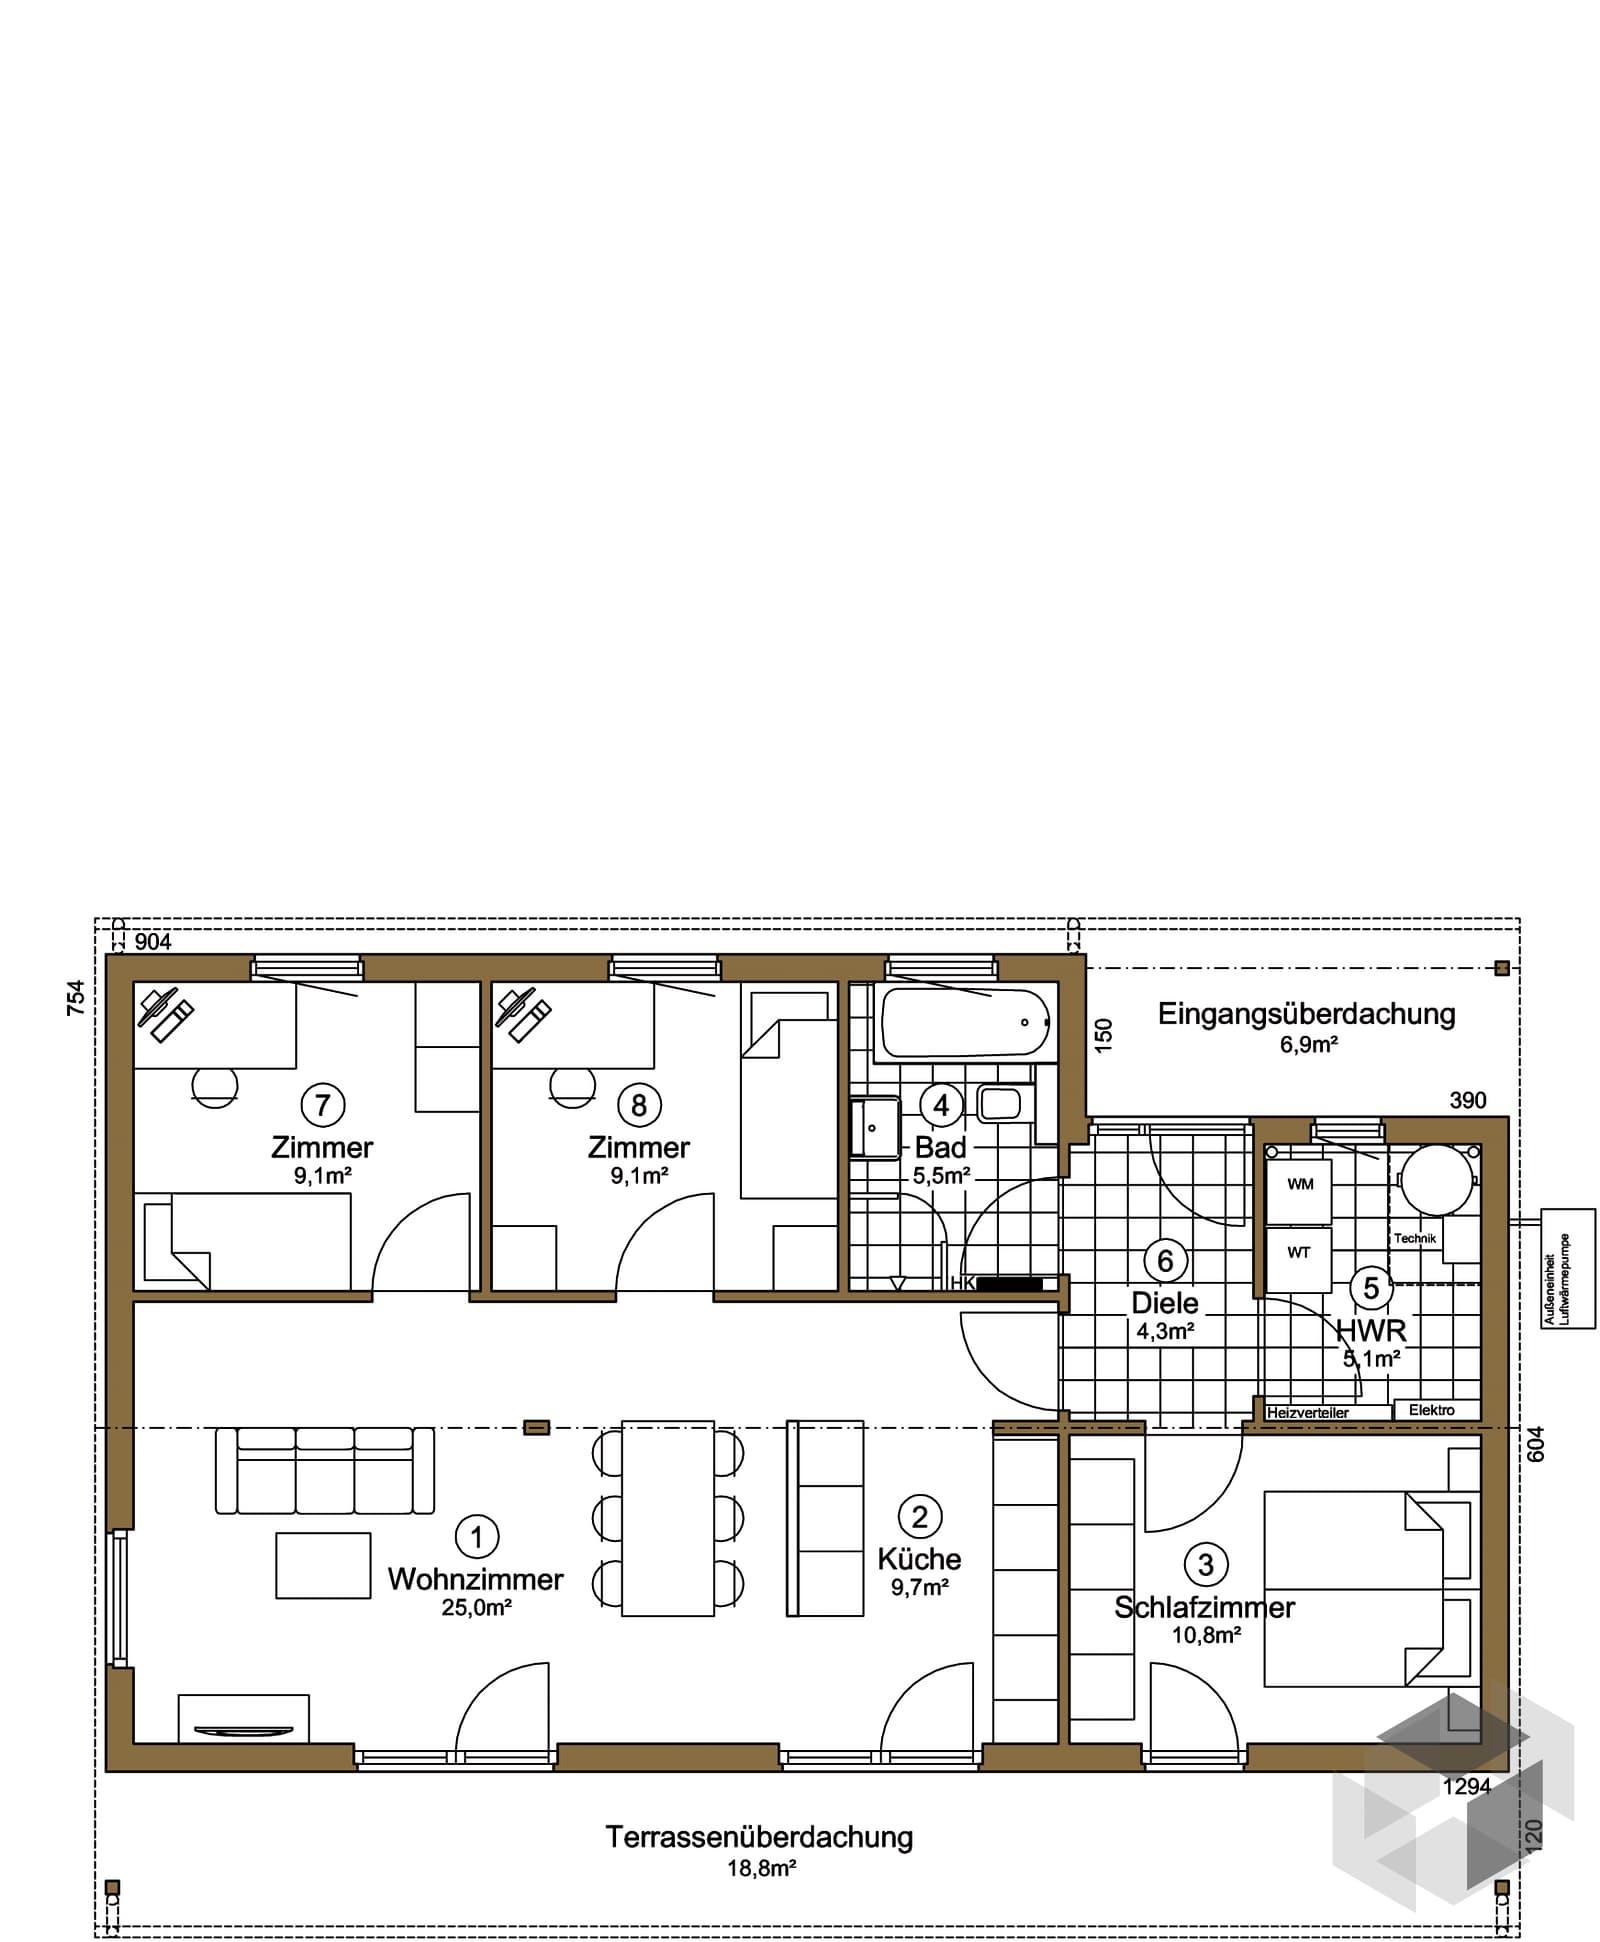 lindholm 79 26 inactive von ebk haus komplette daten bersicht. Black Bedroom Furniture Sets. Home Design Ideas